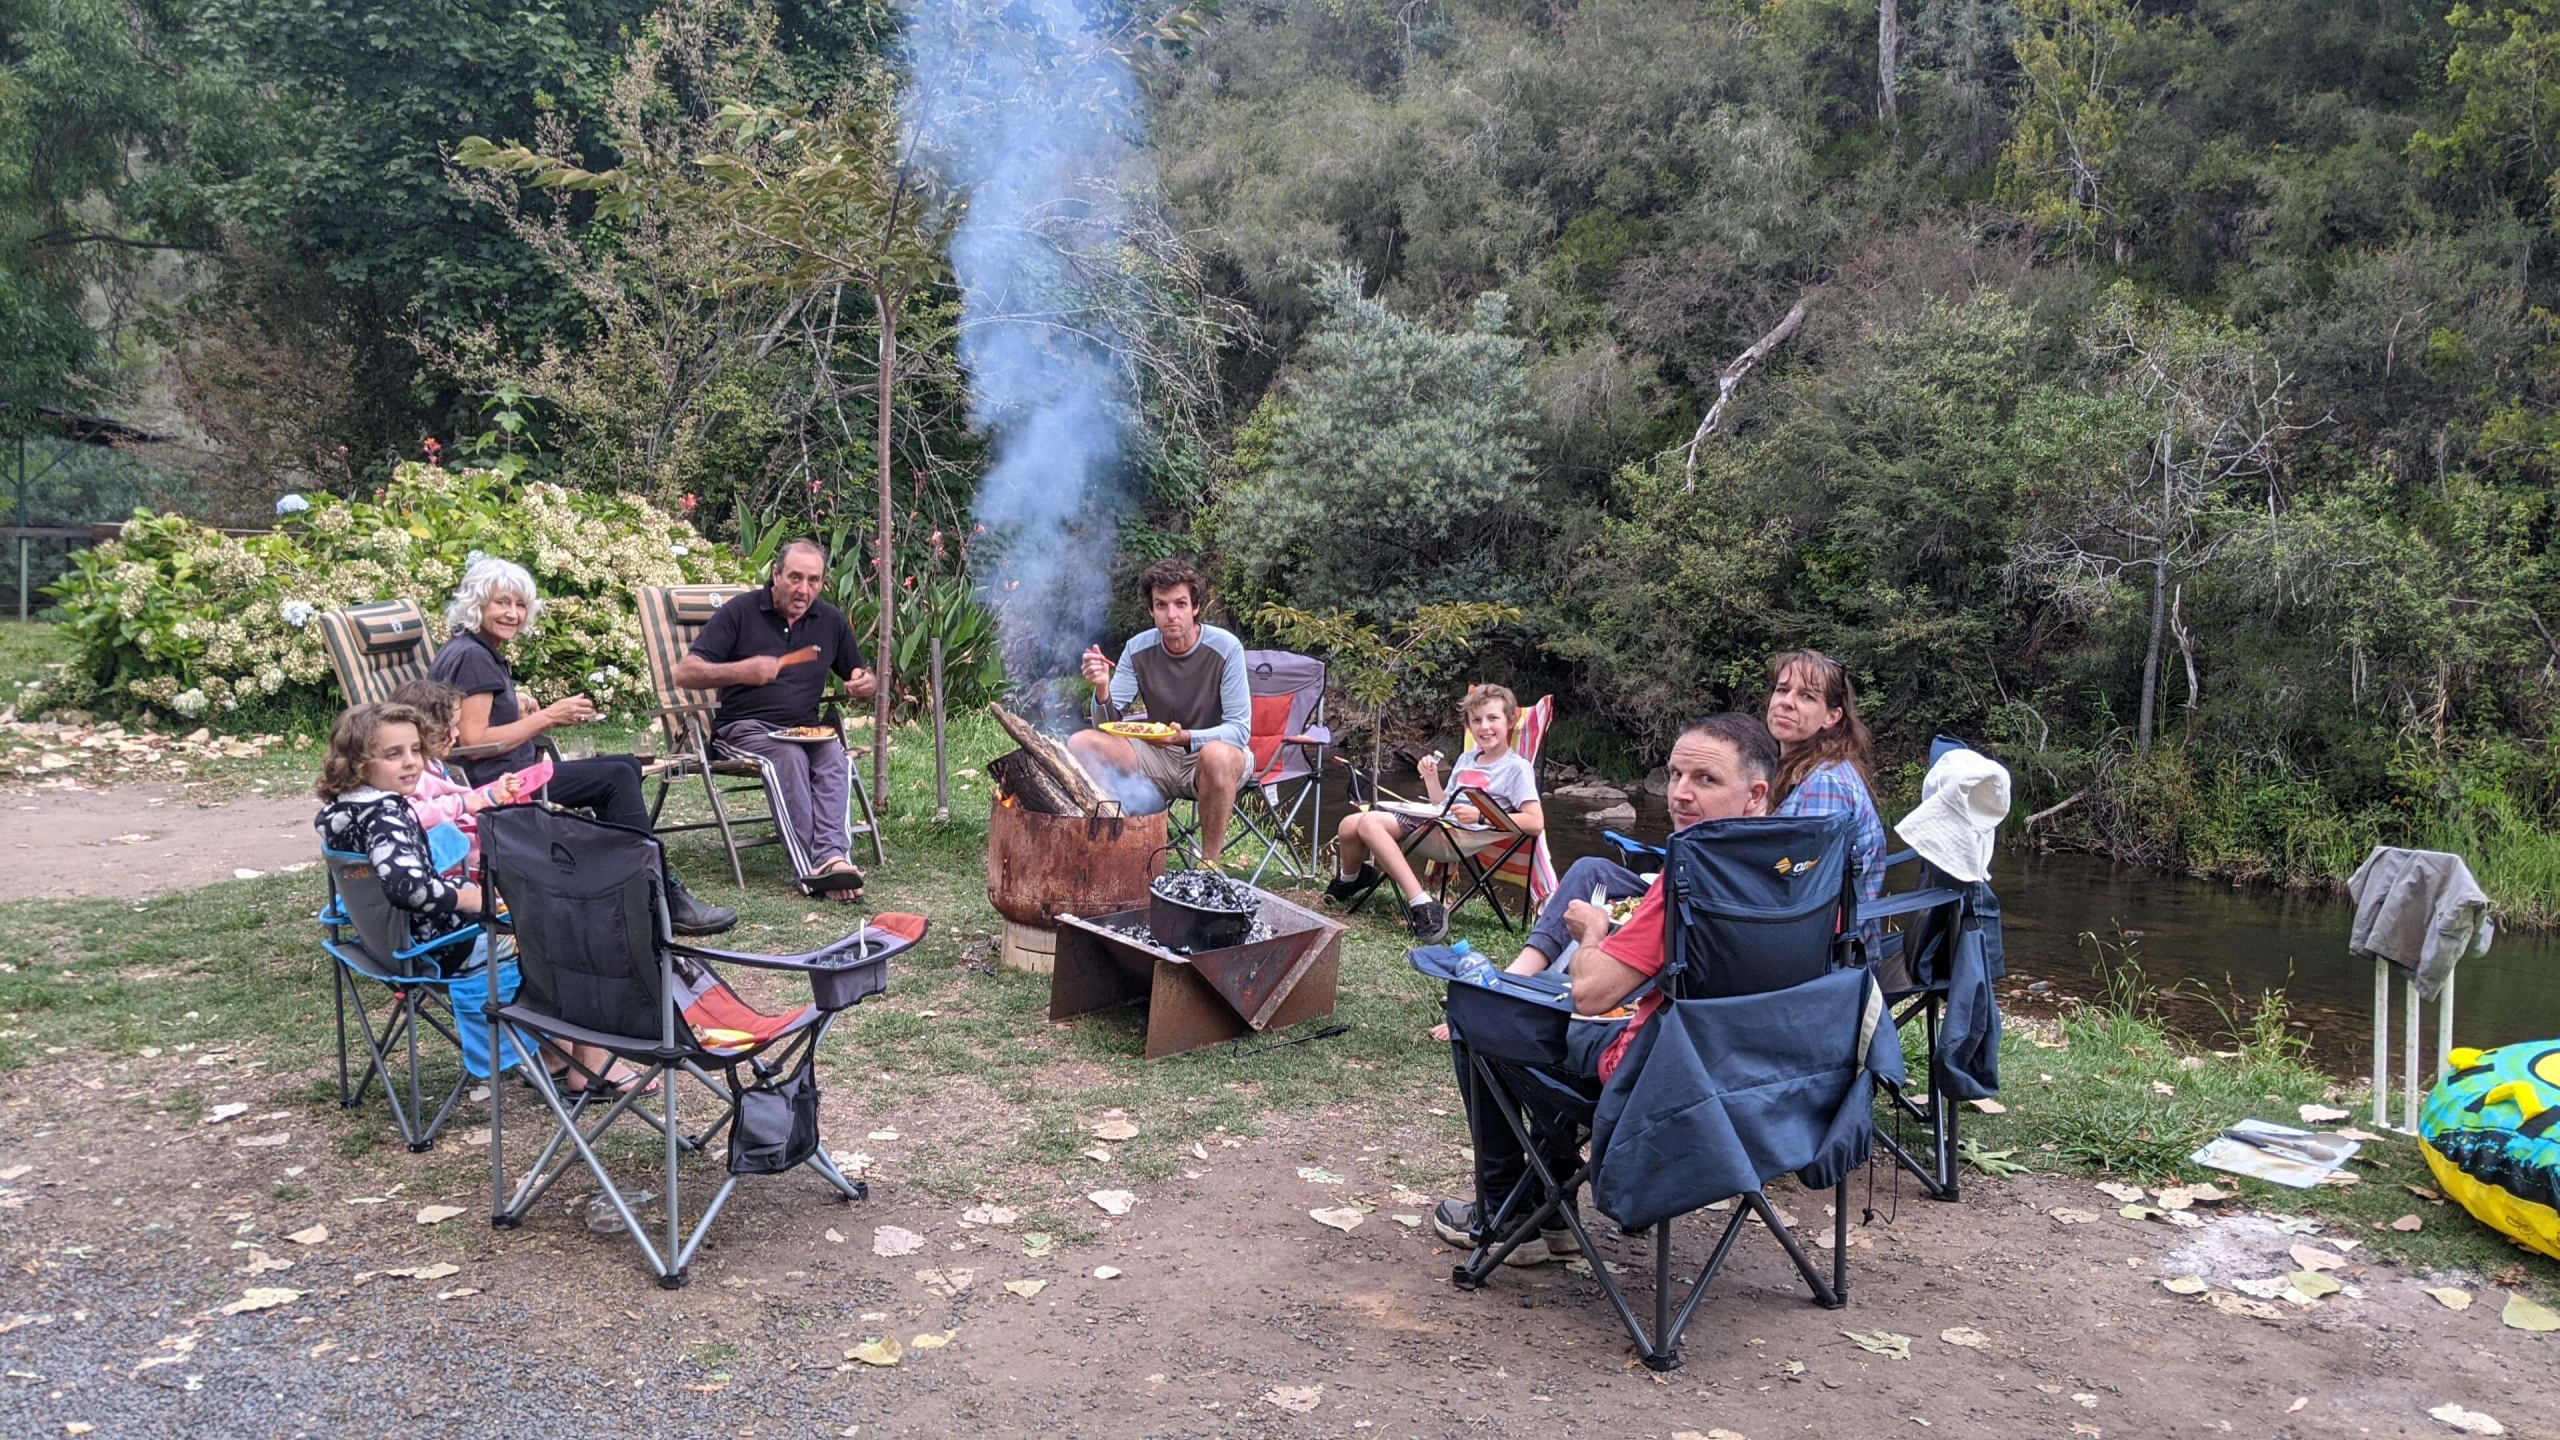 Hill Tribe Travels at Jamieson Caravan Park